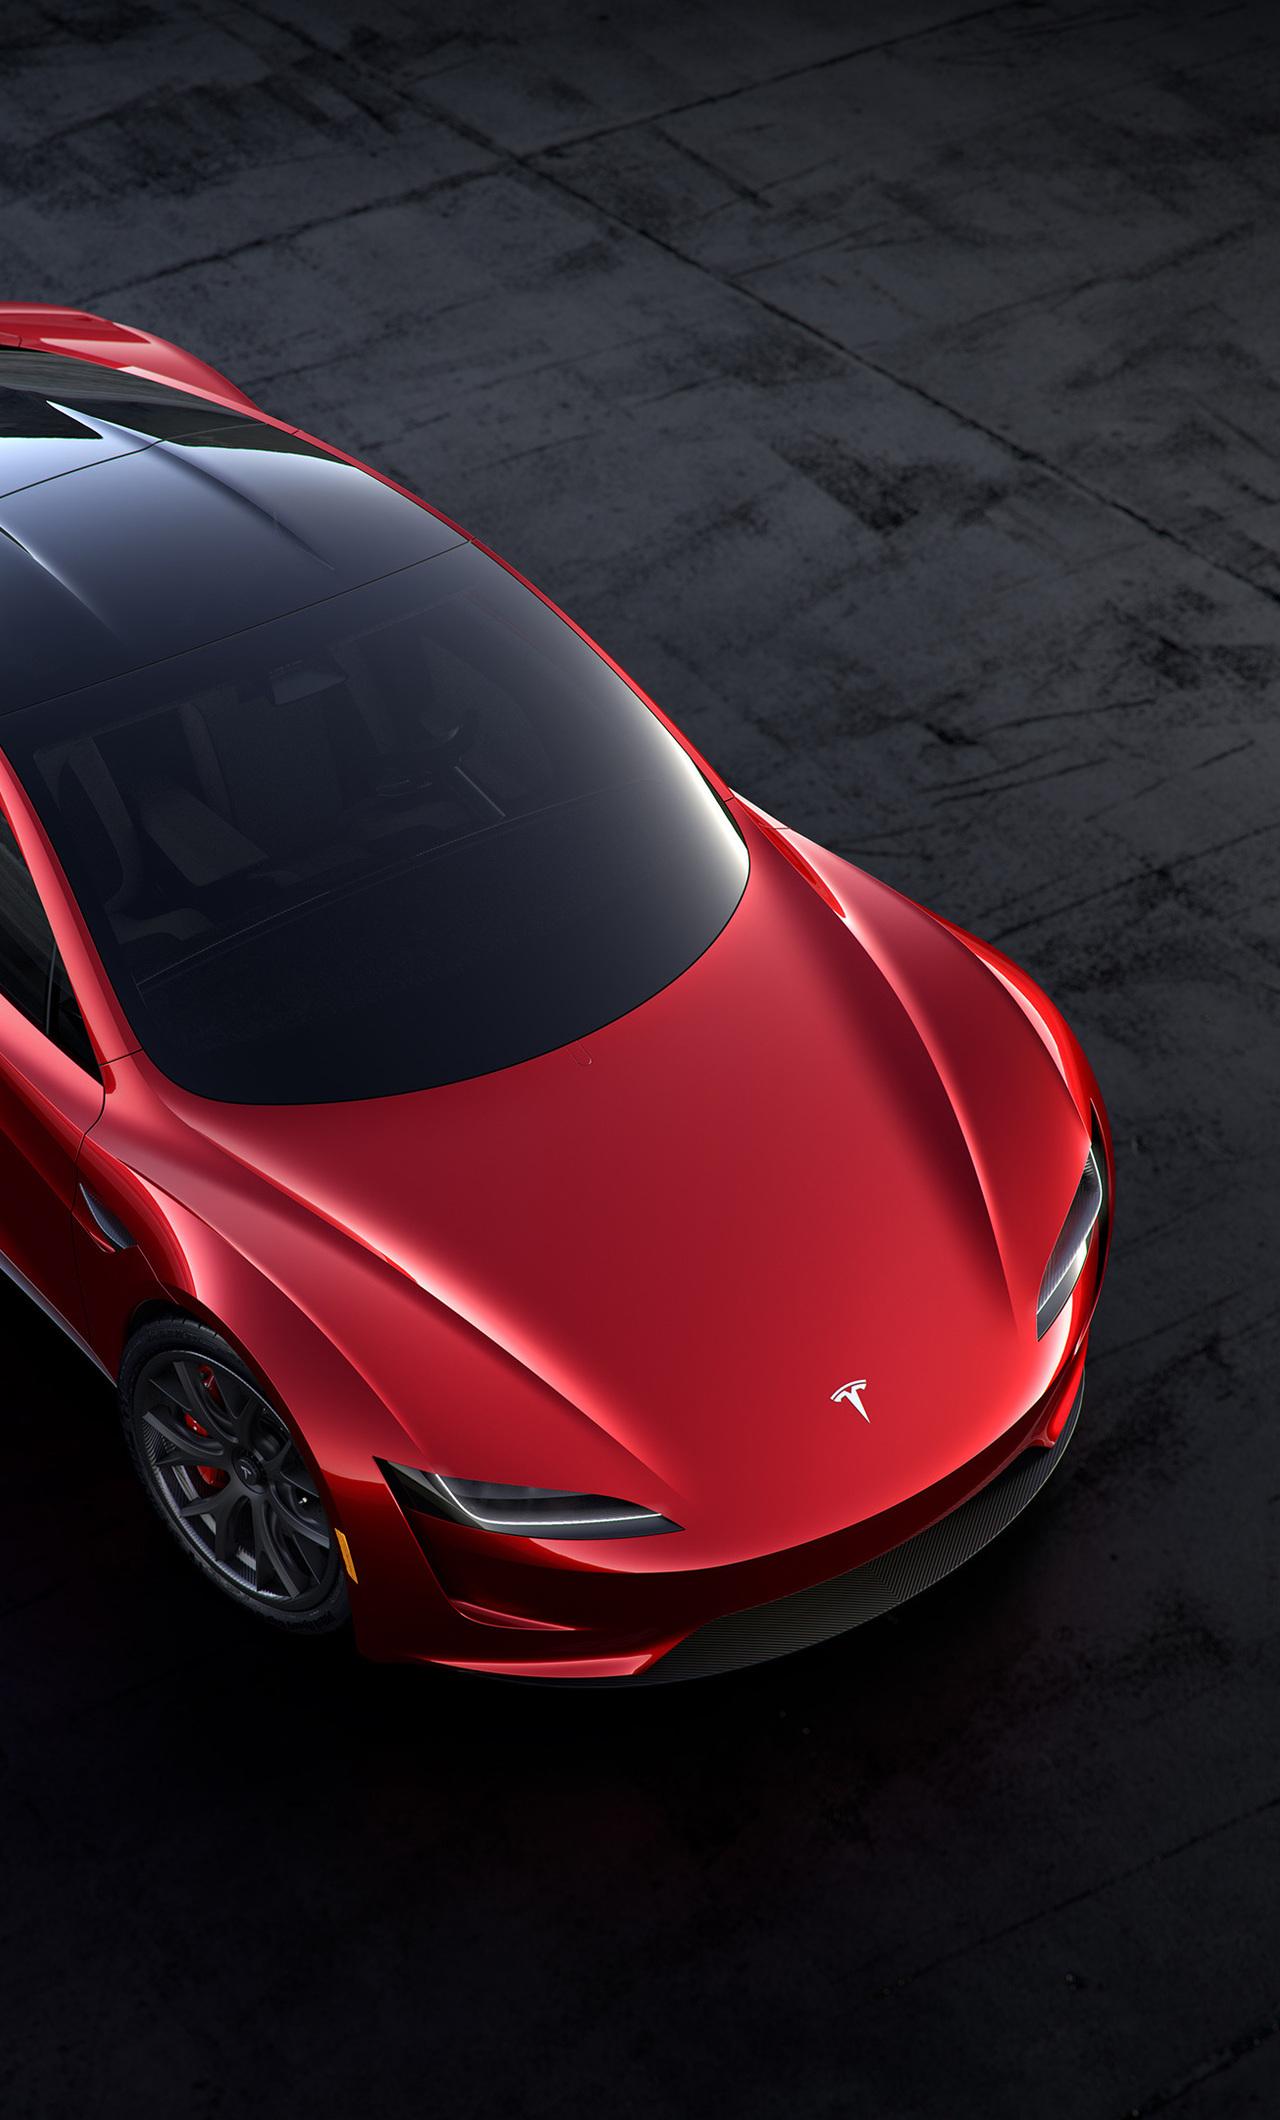 Tesla Roadster Wallpaper Mobile YME Cars Desktop HD Wallpapers 1280x2120